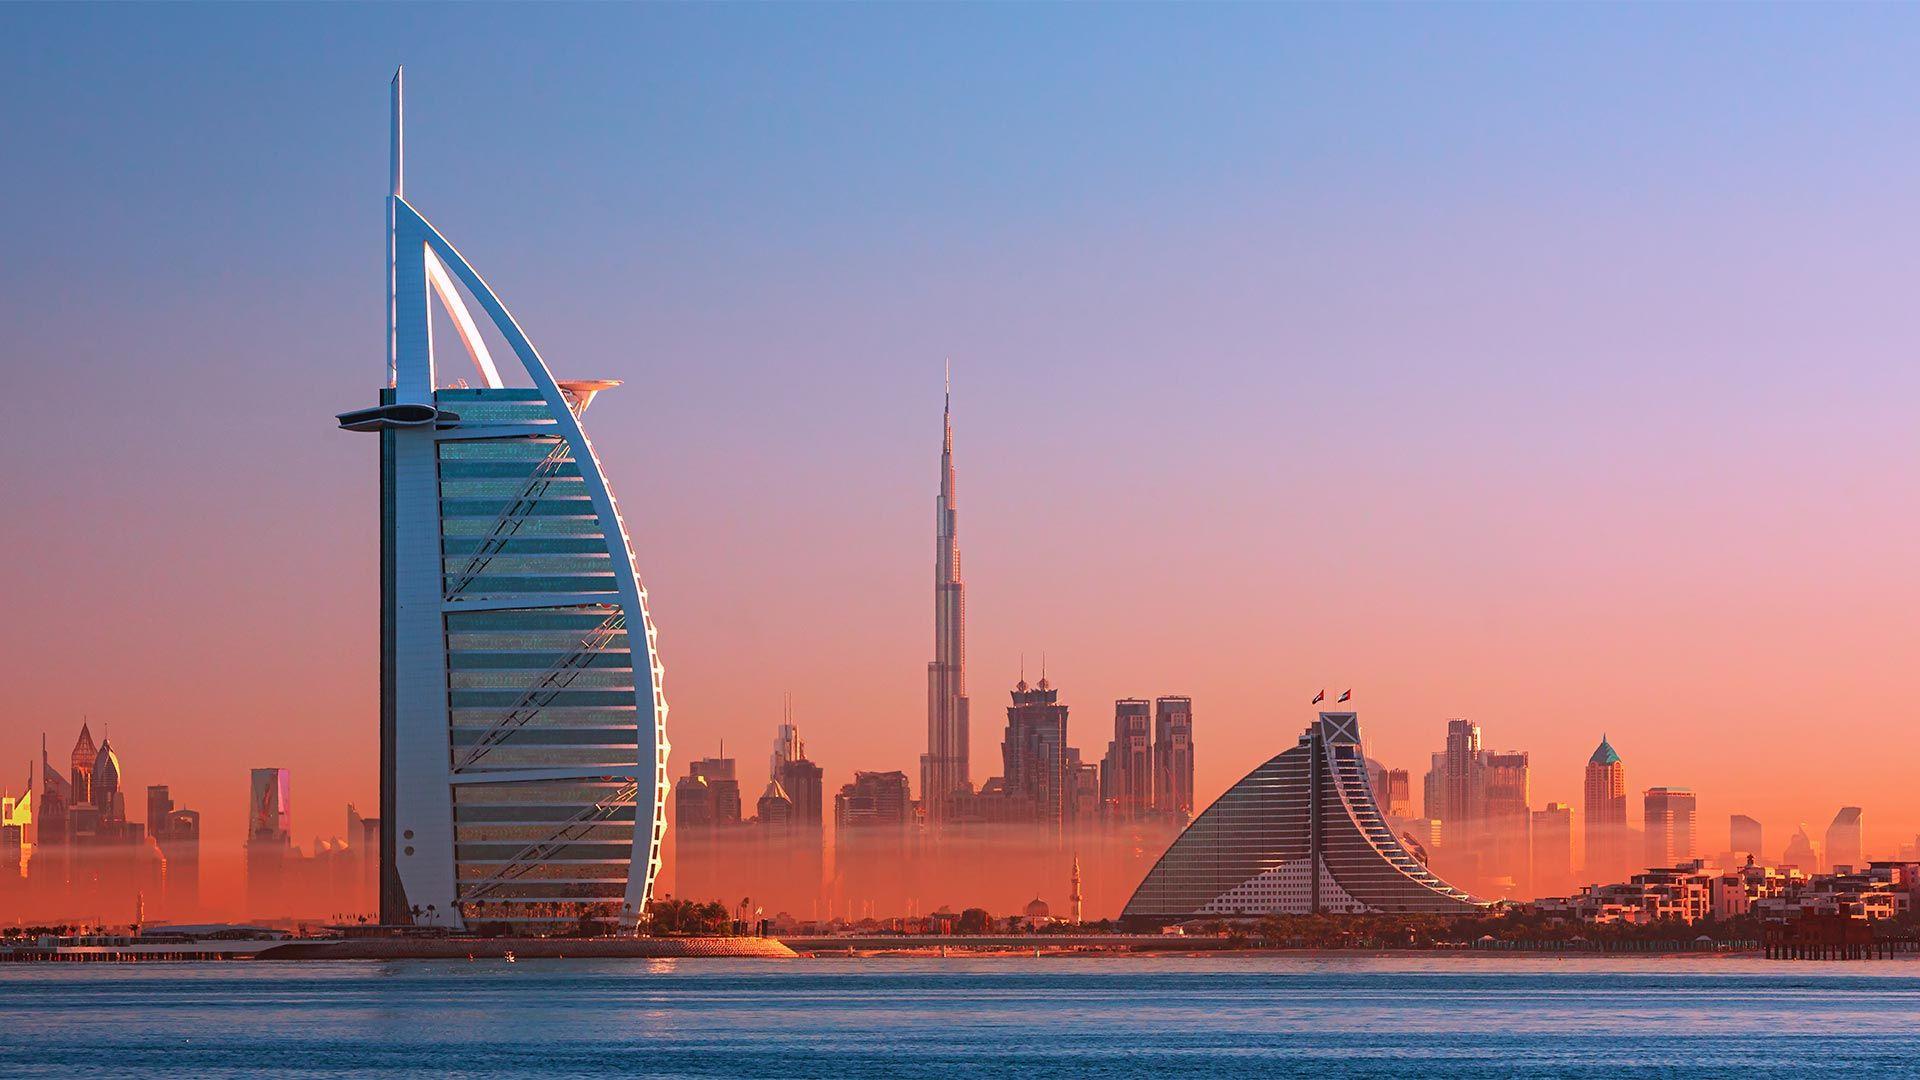 Sejur charter Ras Al Khaima & Dubai, EAU, 8 zile - noiembrie 2021